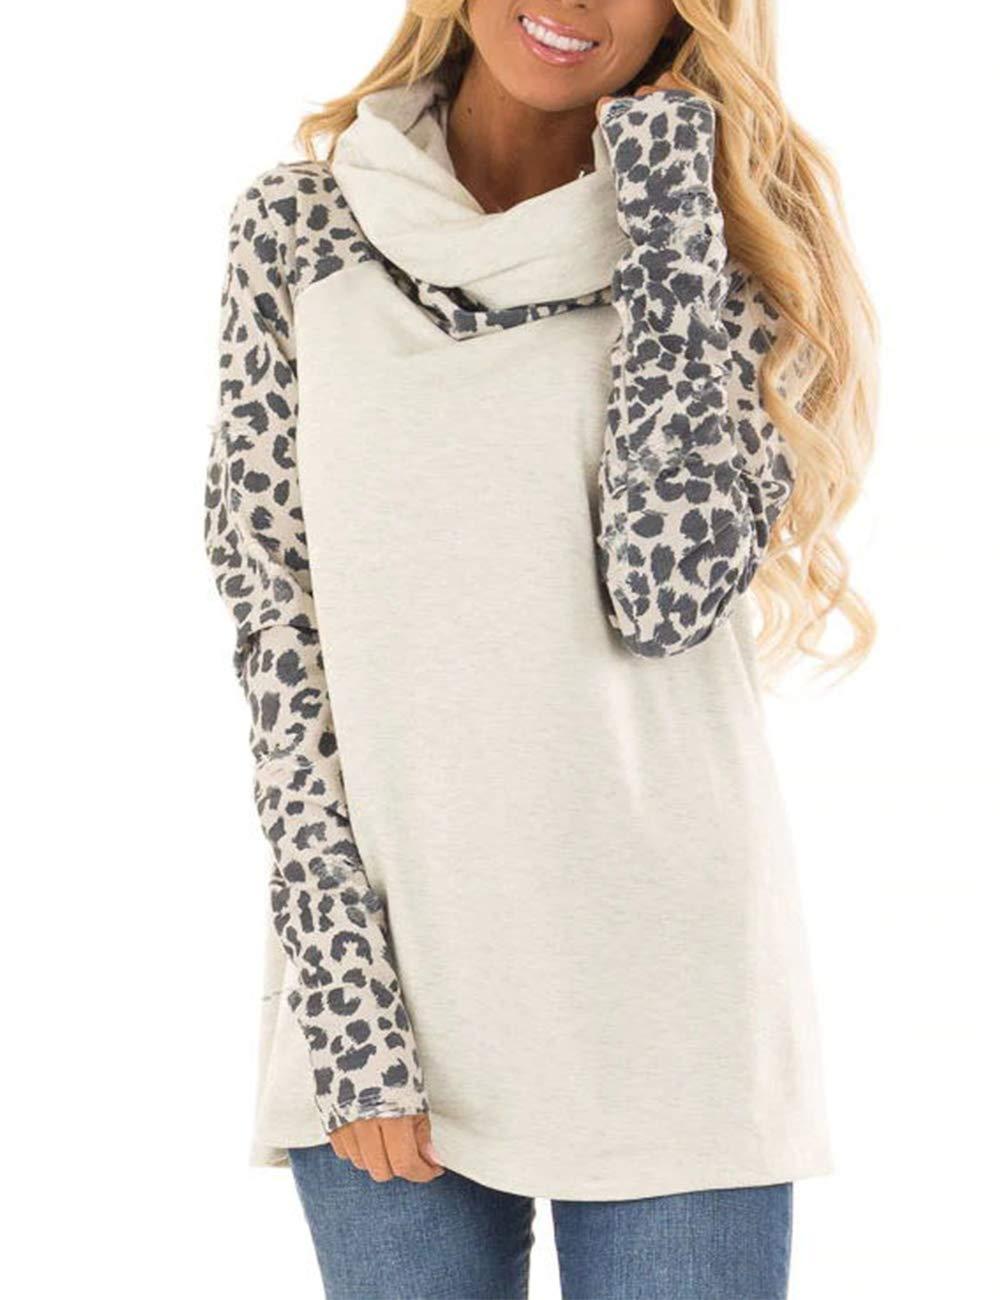 Blivener Women's Casual Sweatshirts Long Sleeve Leopard Print Tops Cowl Neck Raglan Shirts White L by Blivener